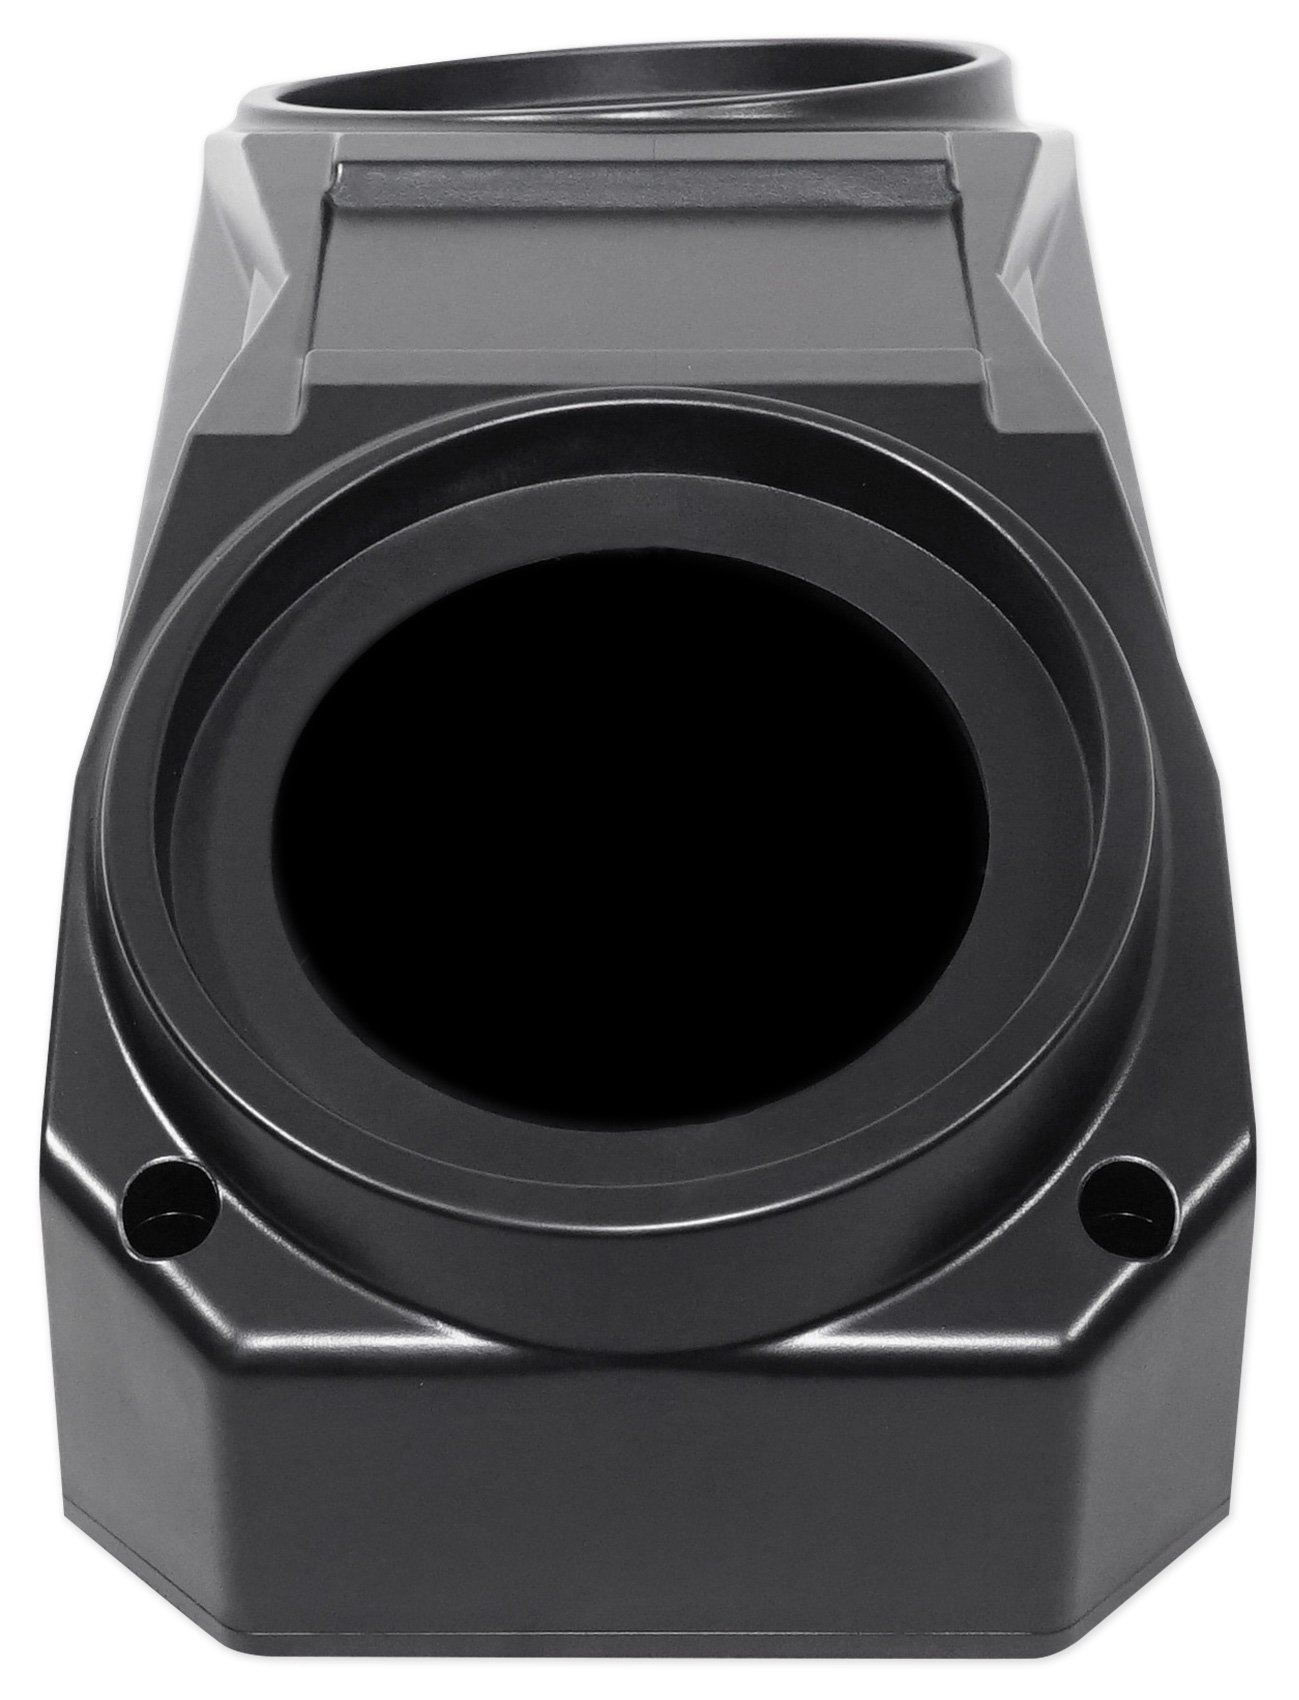 Metra OH-DIN01 6.5'' Overhead Speaker+Receiver Enclosure Polaris RZR/ATV/UTV/Cart by Metra (Image #5)